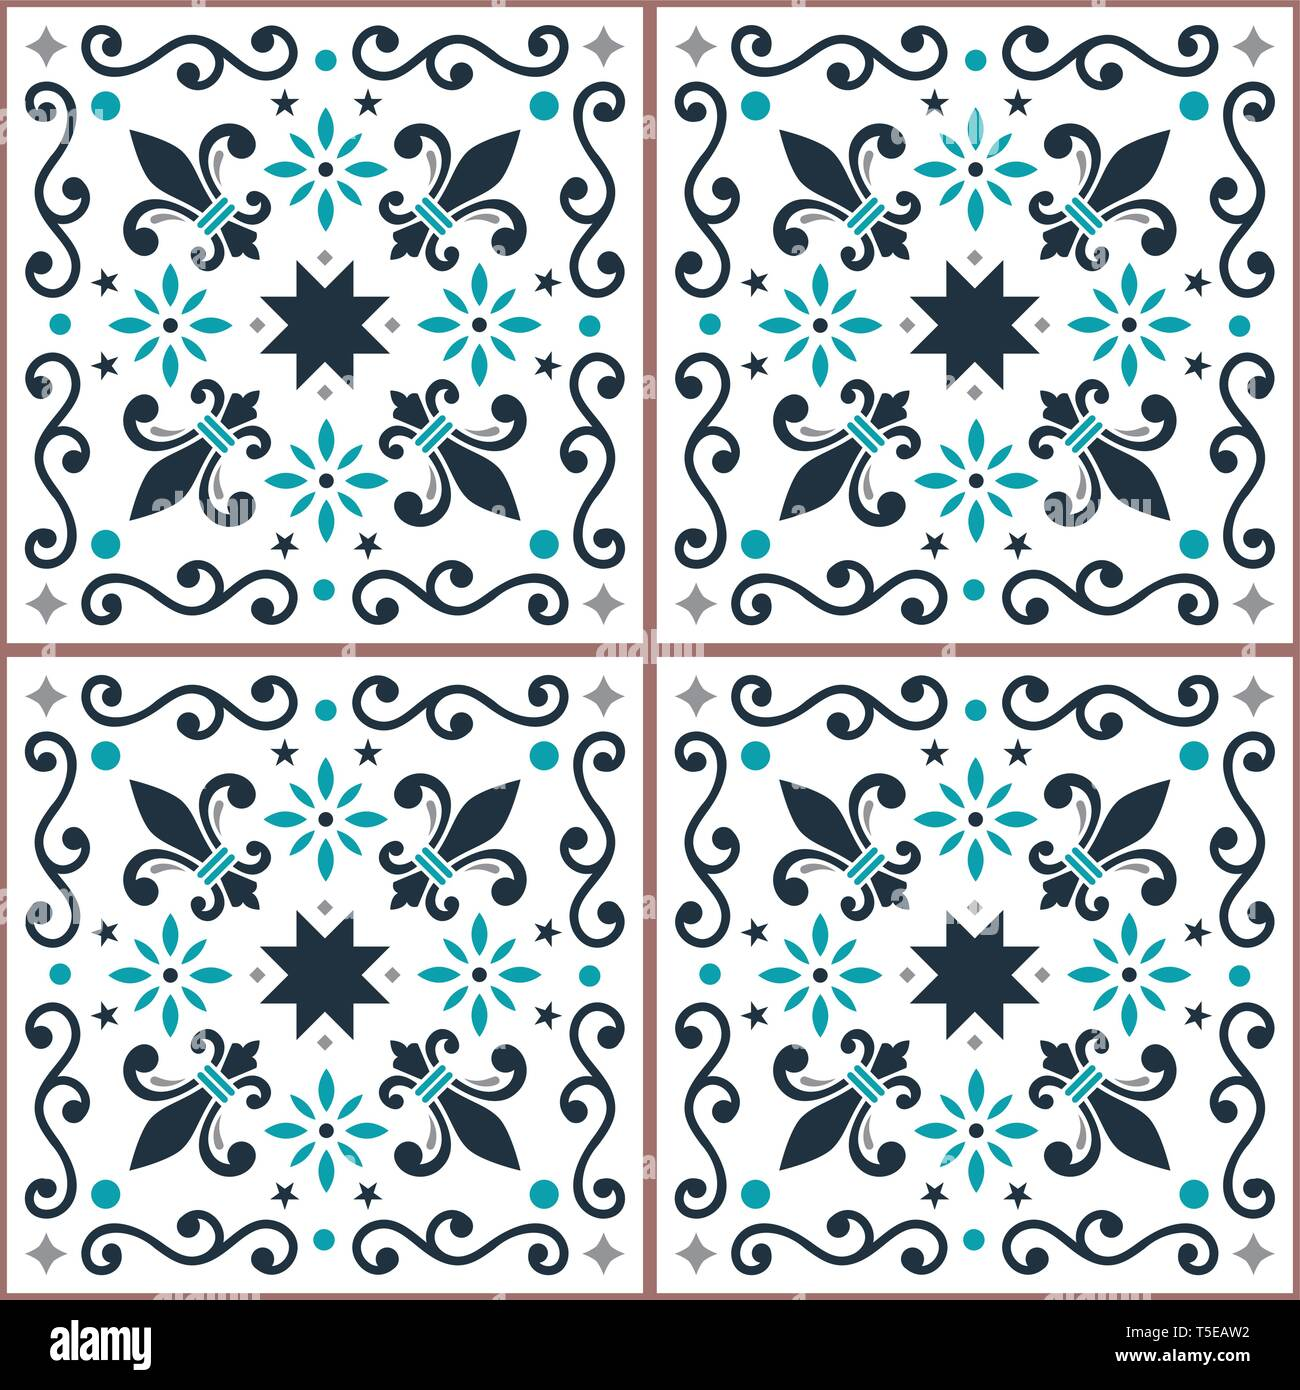 Azulejos seamless vector pattern, Portuguese Lisbon tiles design with fleur de lis, flowers and geometric shapes - Stock Vector